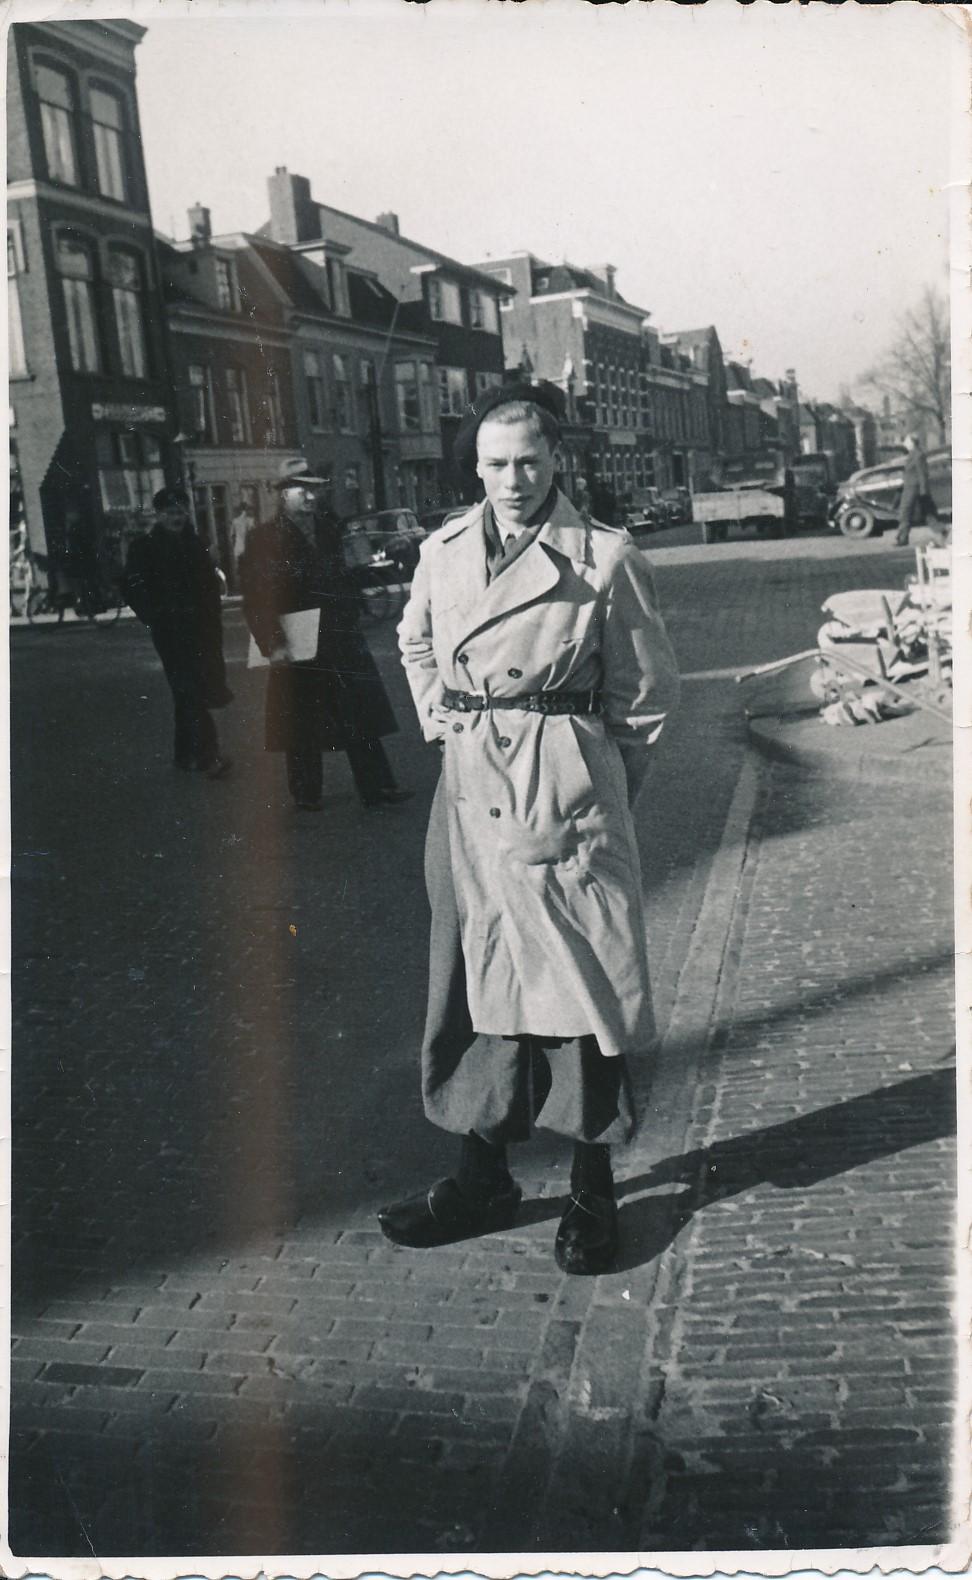 Fotoalbum Andre Kamsma, 133, Lauw Kamsma, Boerefeint, 1954